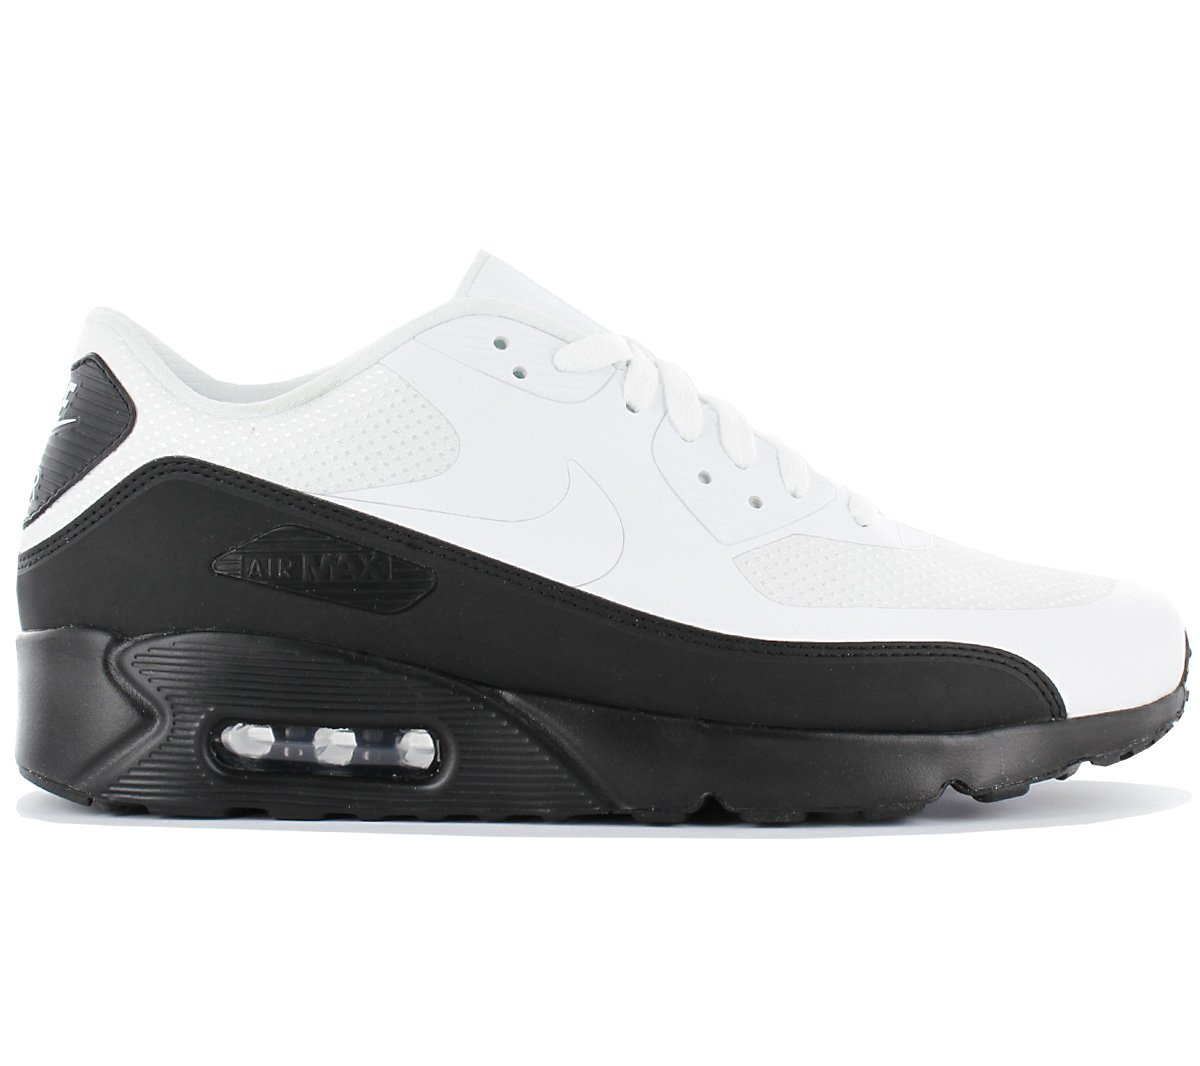 online store dd9dc 062f5 Nike Air Max 90 Ultra 2.0 Essential 875695-015 Herren Schuhe Turnschuhe  Sneaker Weiszlig -Schwarz 11 D(M) US Schwarz (Schwarz-wei ) -  sommerprogramme.de